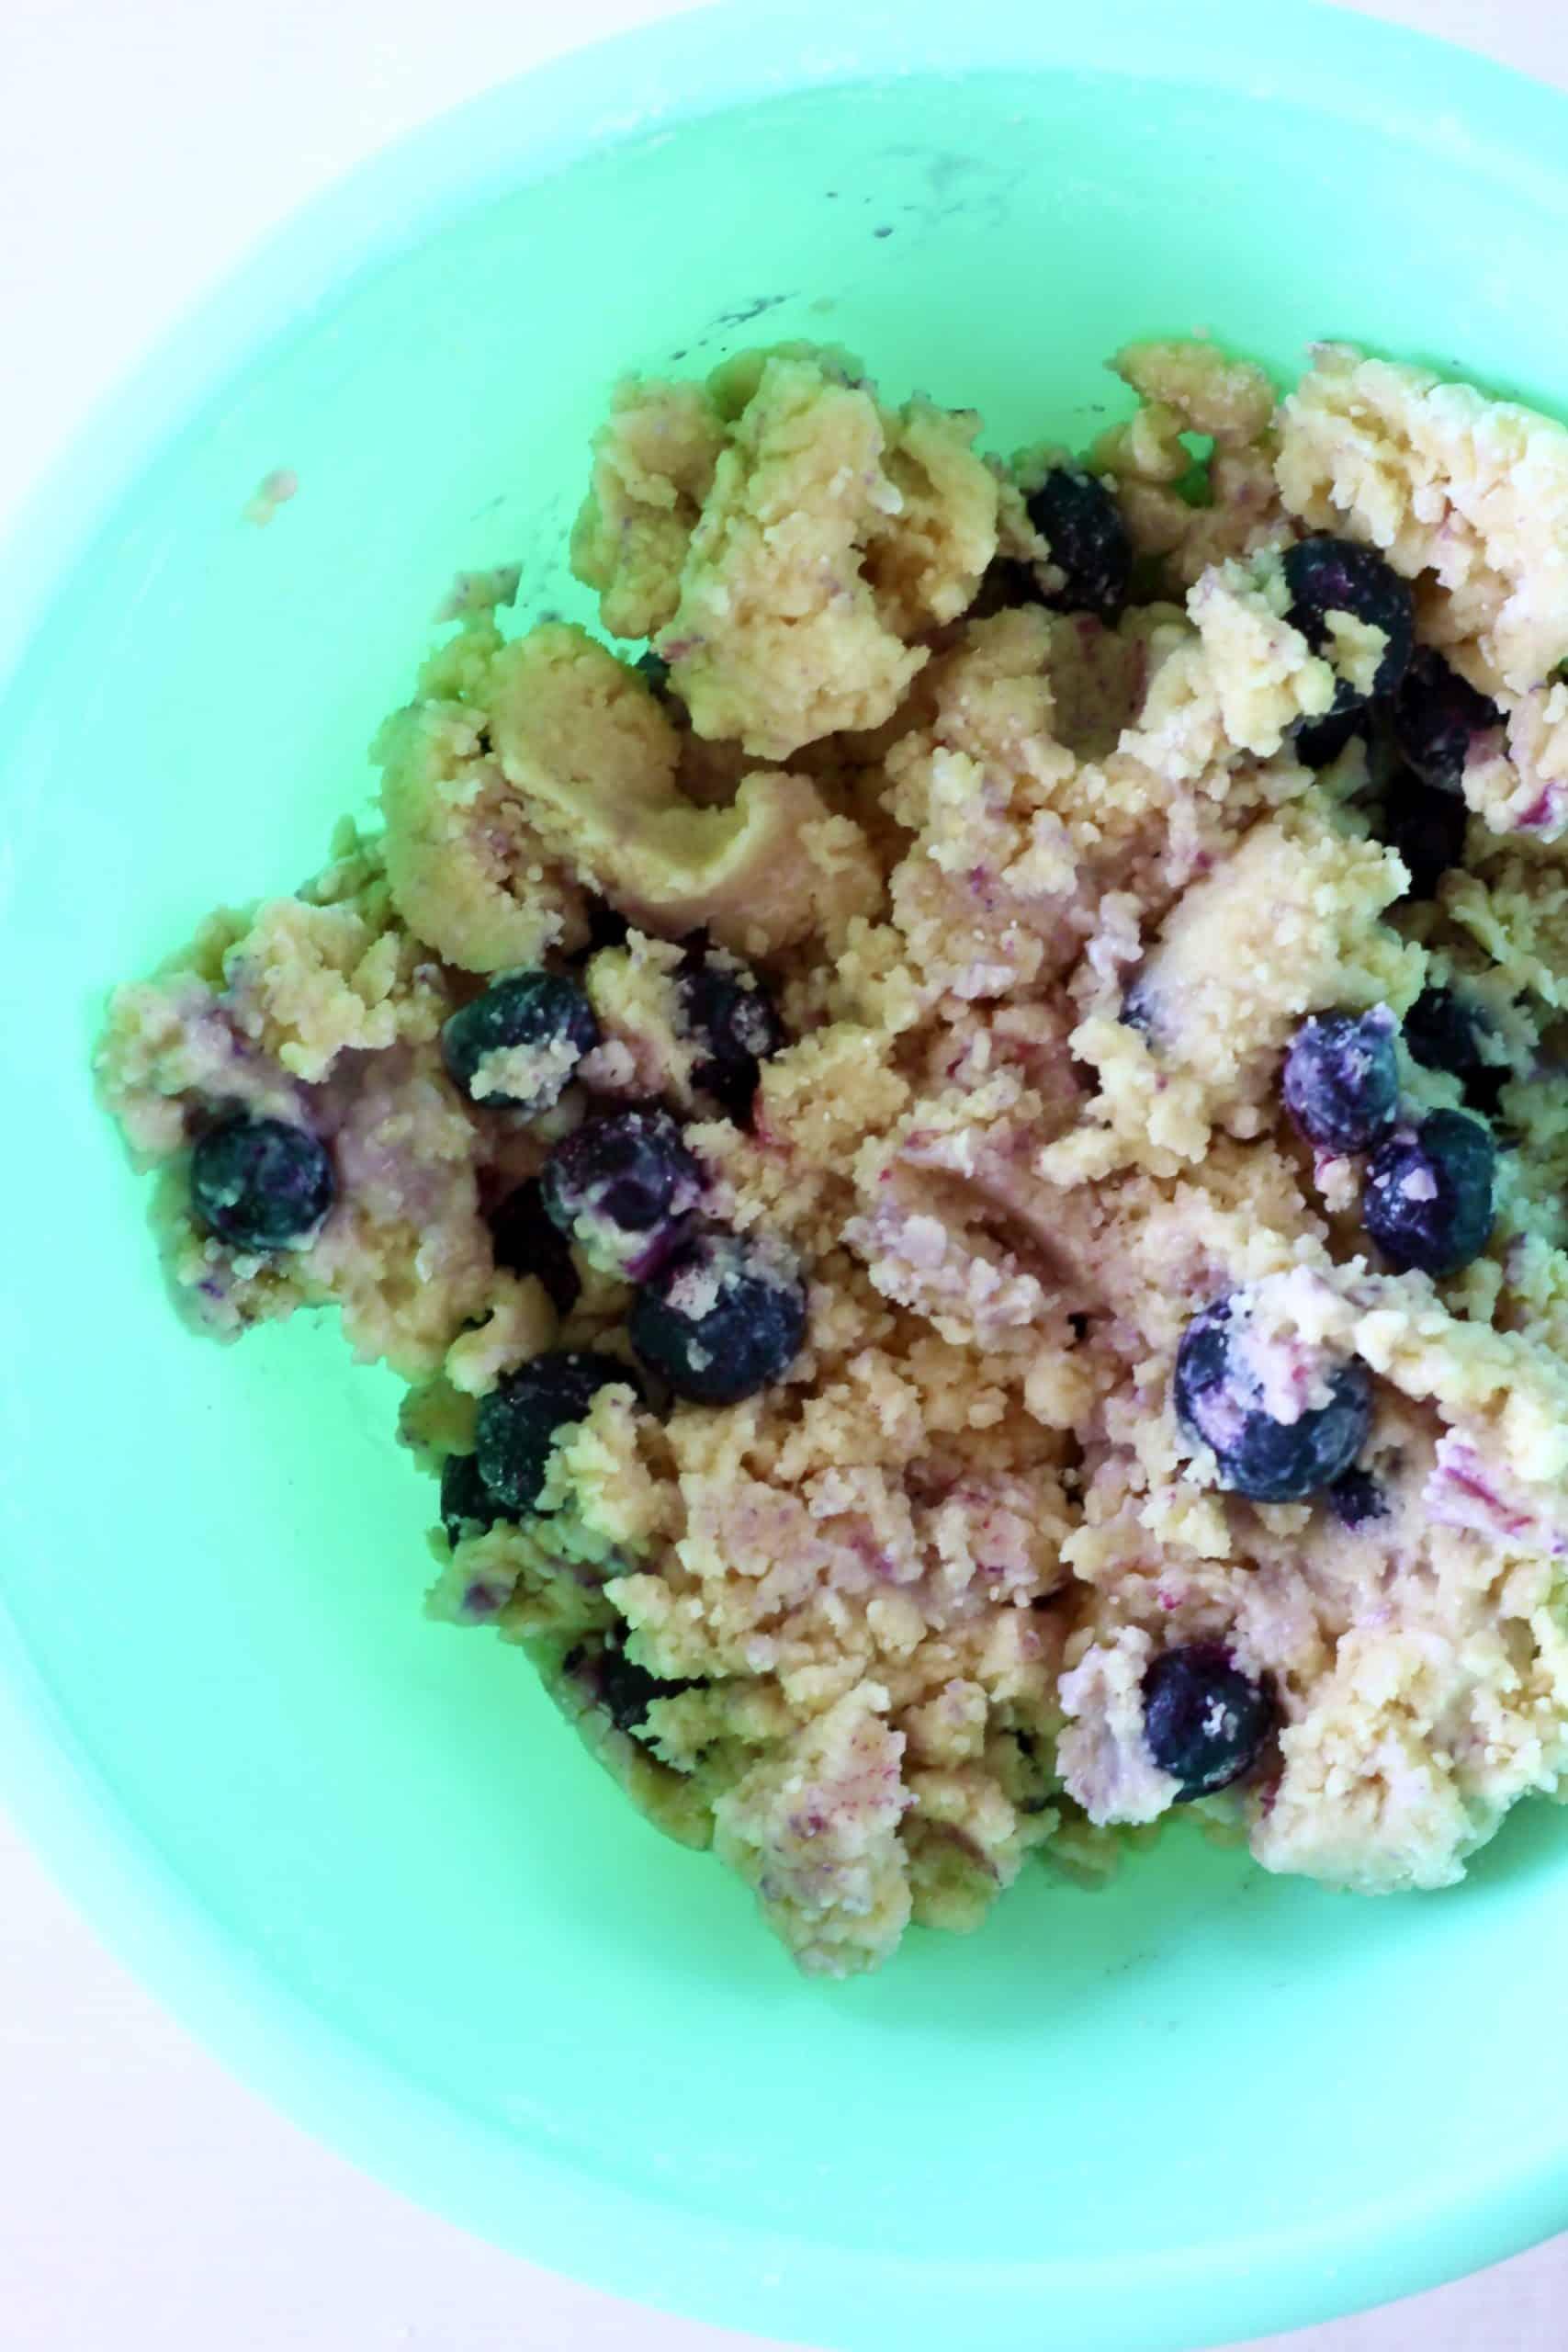 Raw gluten-free vegan lemon blueberry cookie dough in a bowl